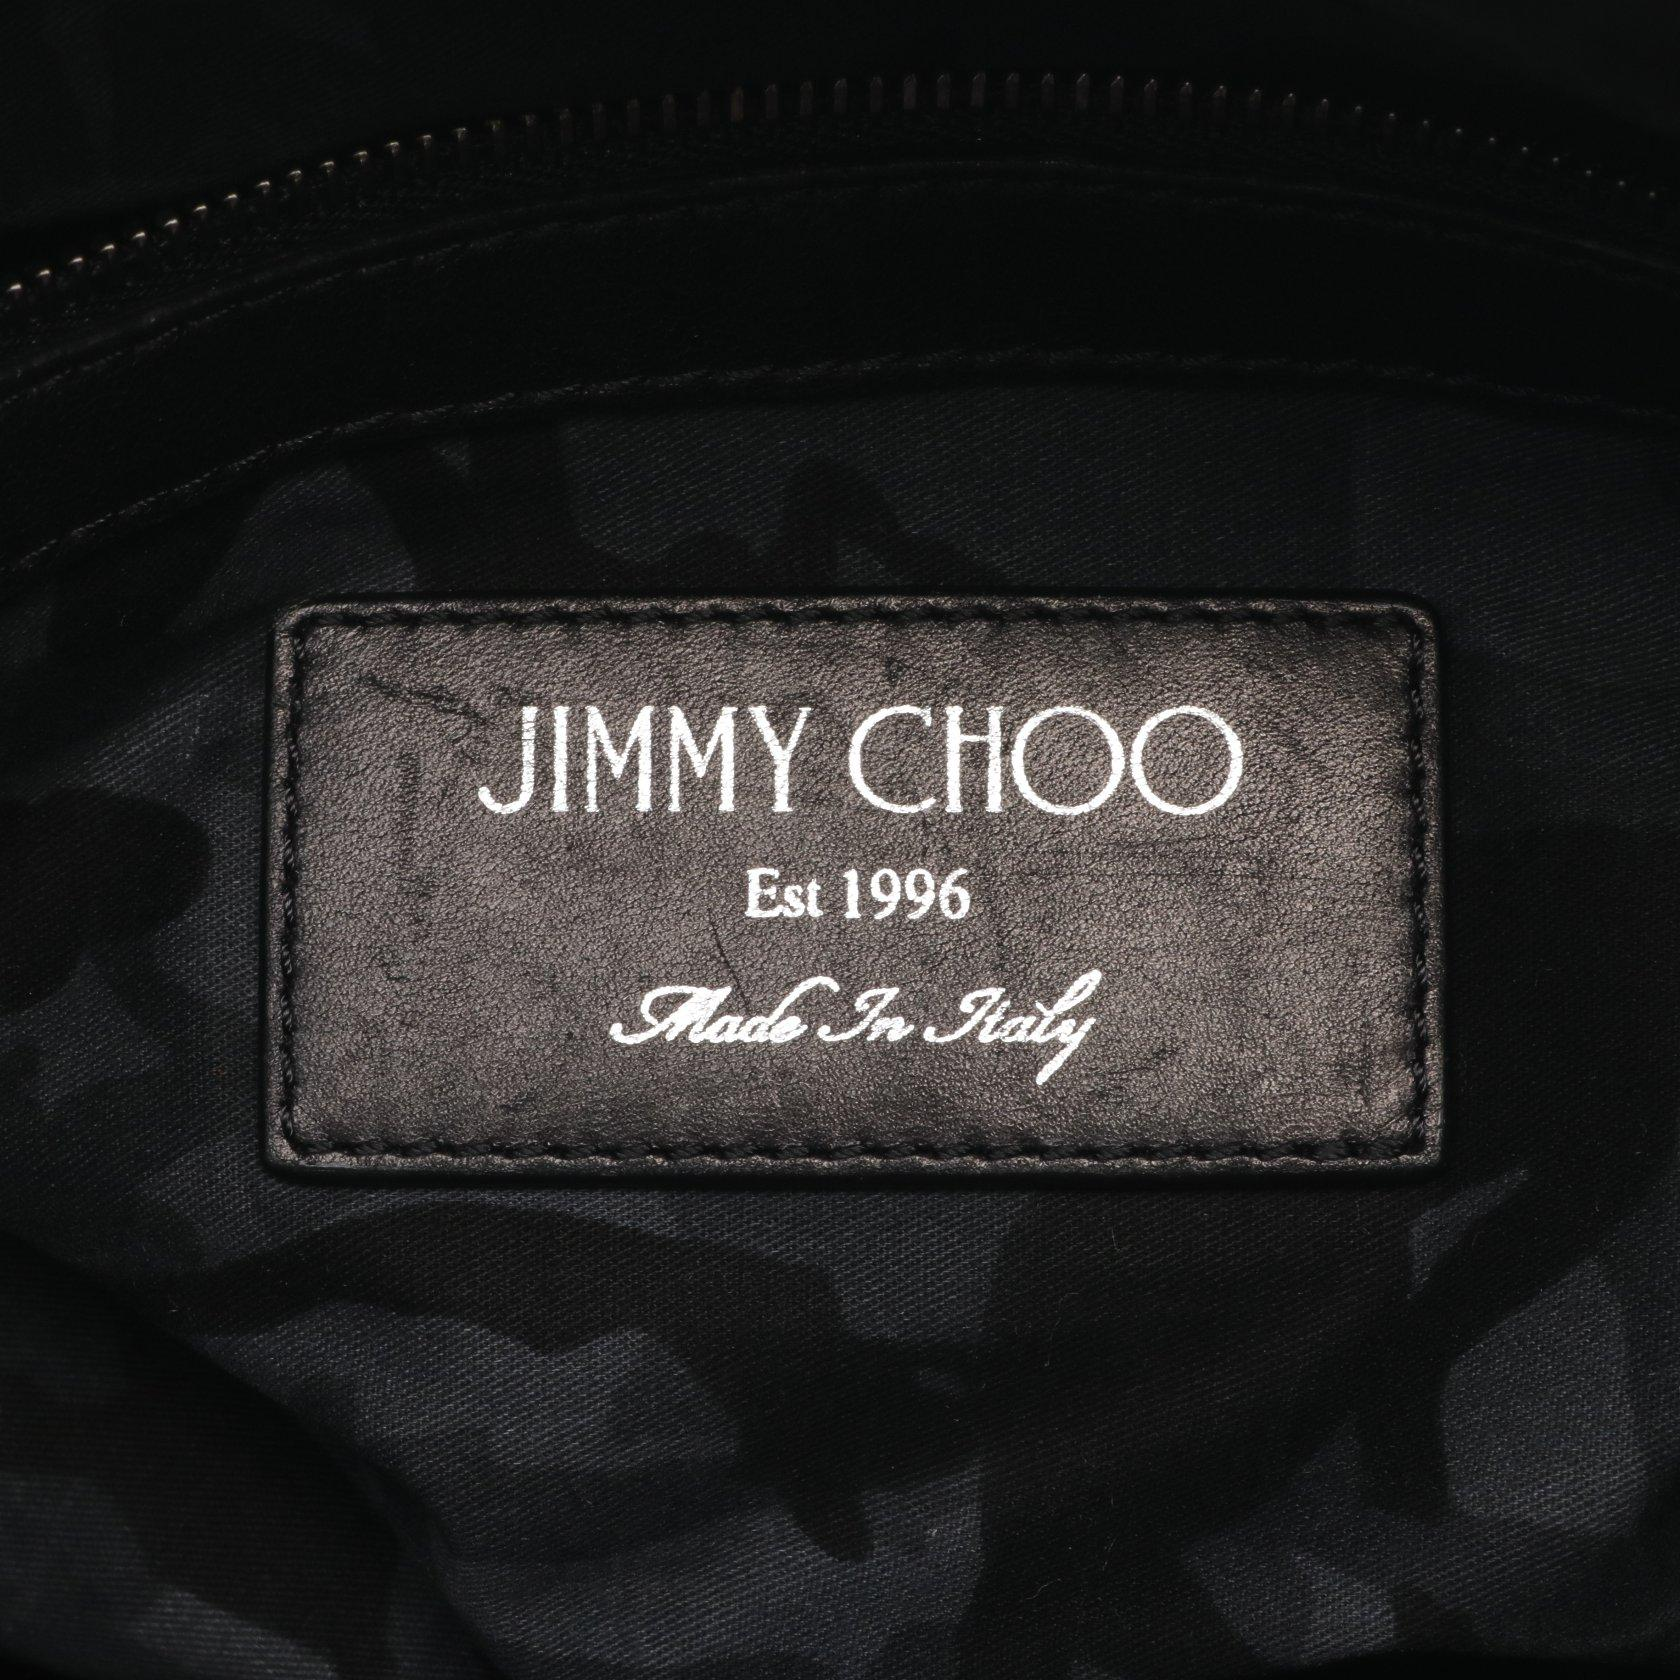 JIMMY CHOO・バッグ・DEREK クラッチバッグ レザー ブラック スタースタッズ